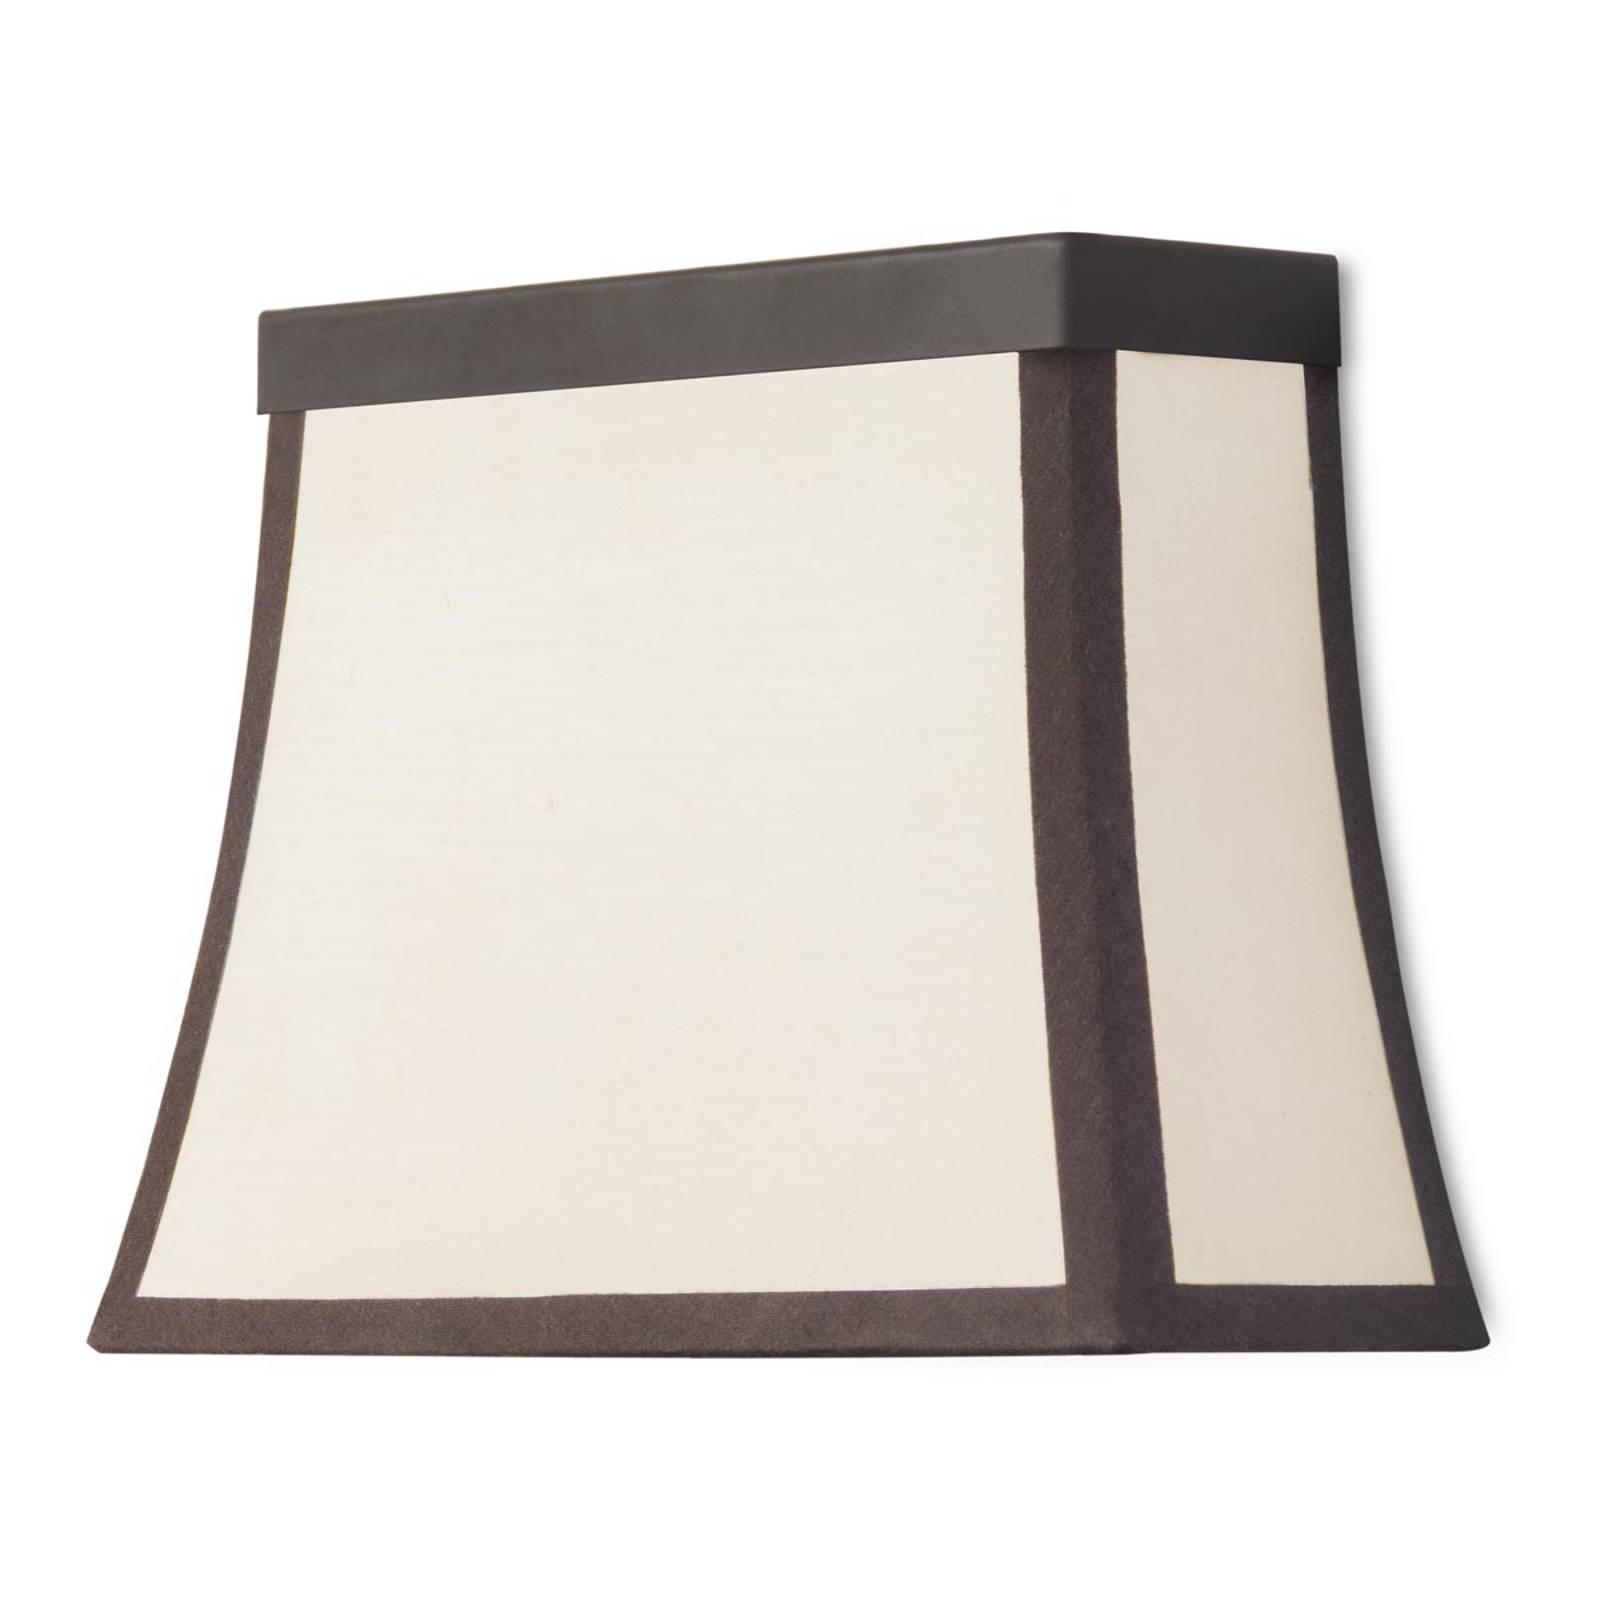 Fancy - textielen LED-wandlamp